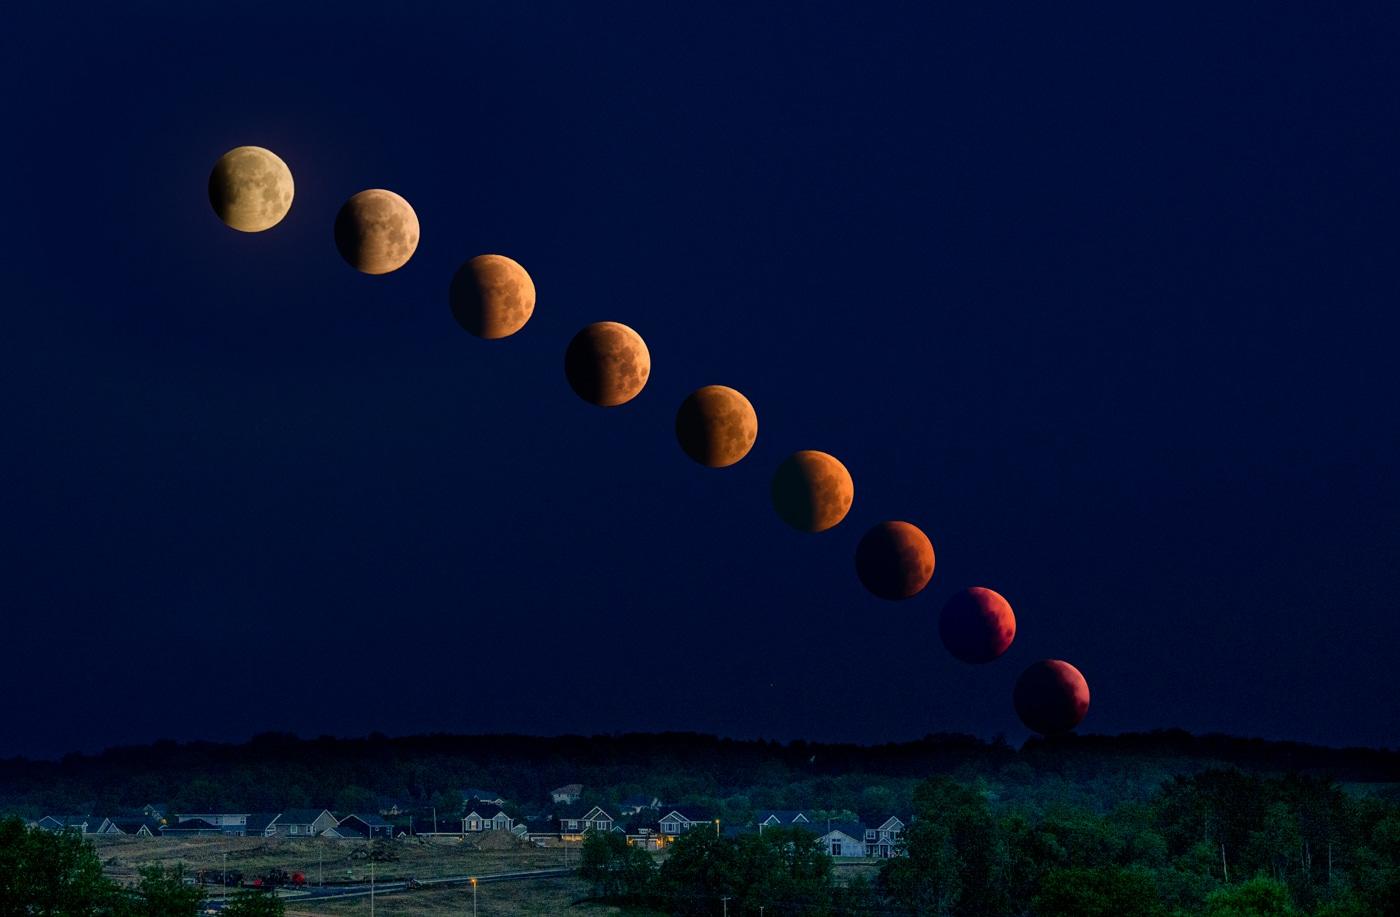 A Lunar Eclipse — May 26, 2021